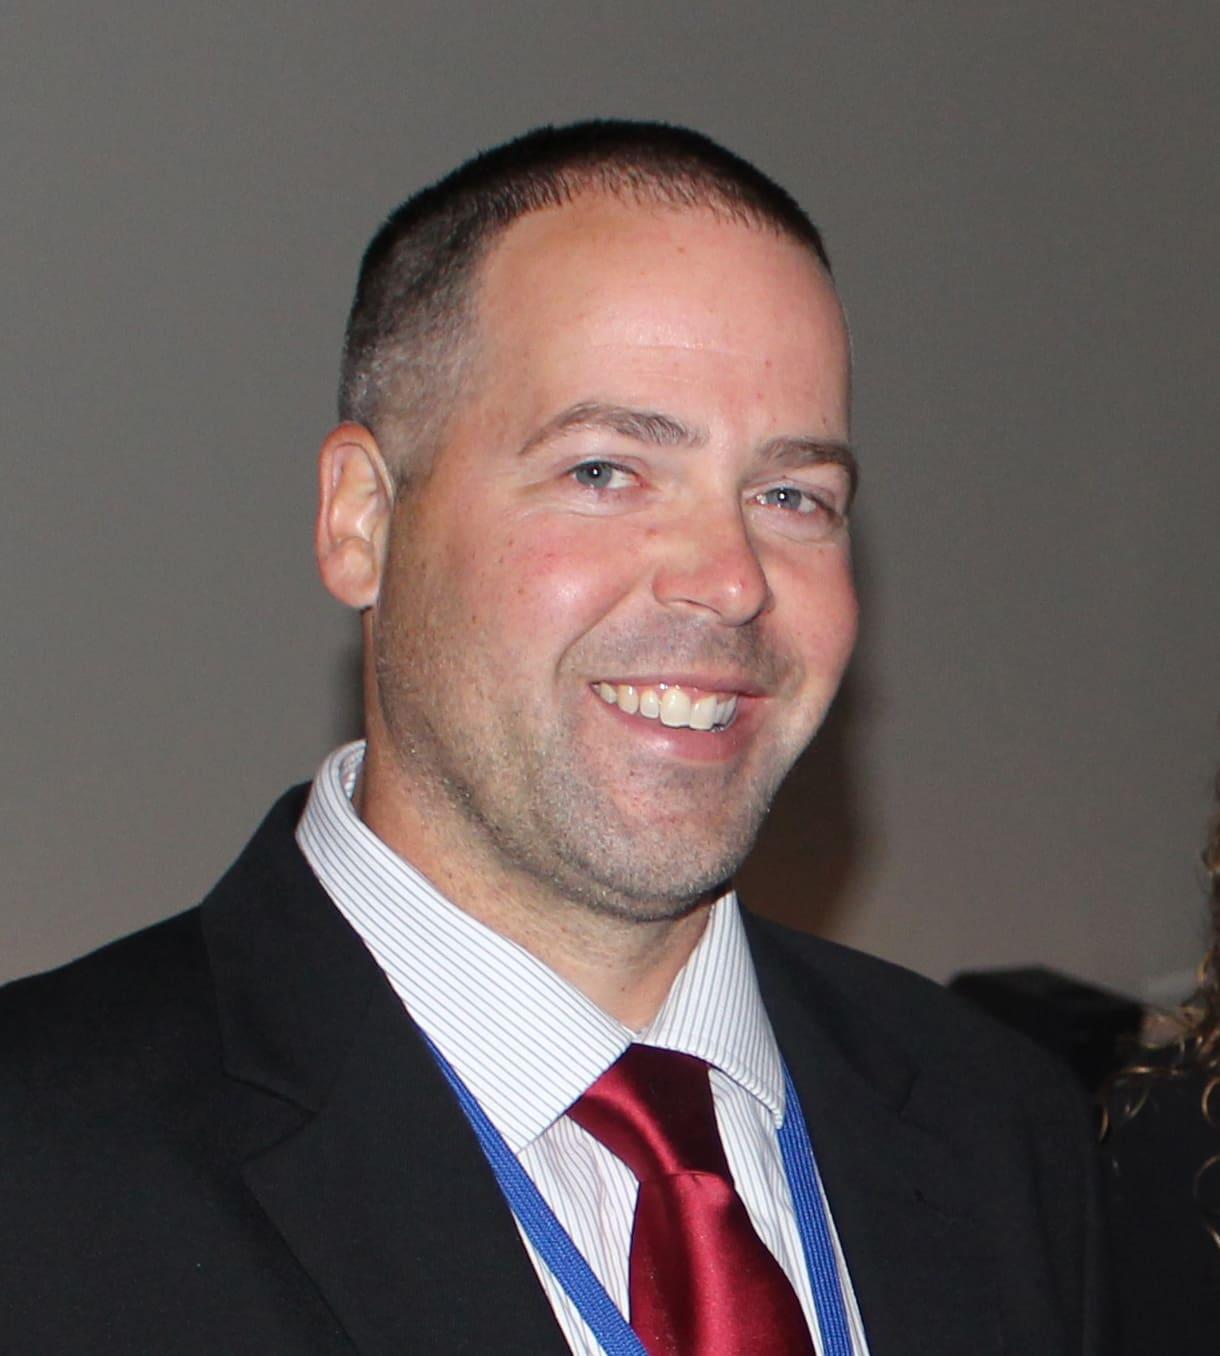 Head-shot of Ben Gleason, One Water delegate and Iowa Corn representative